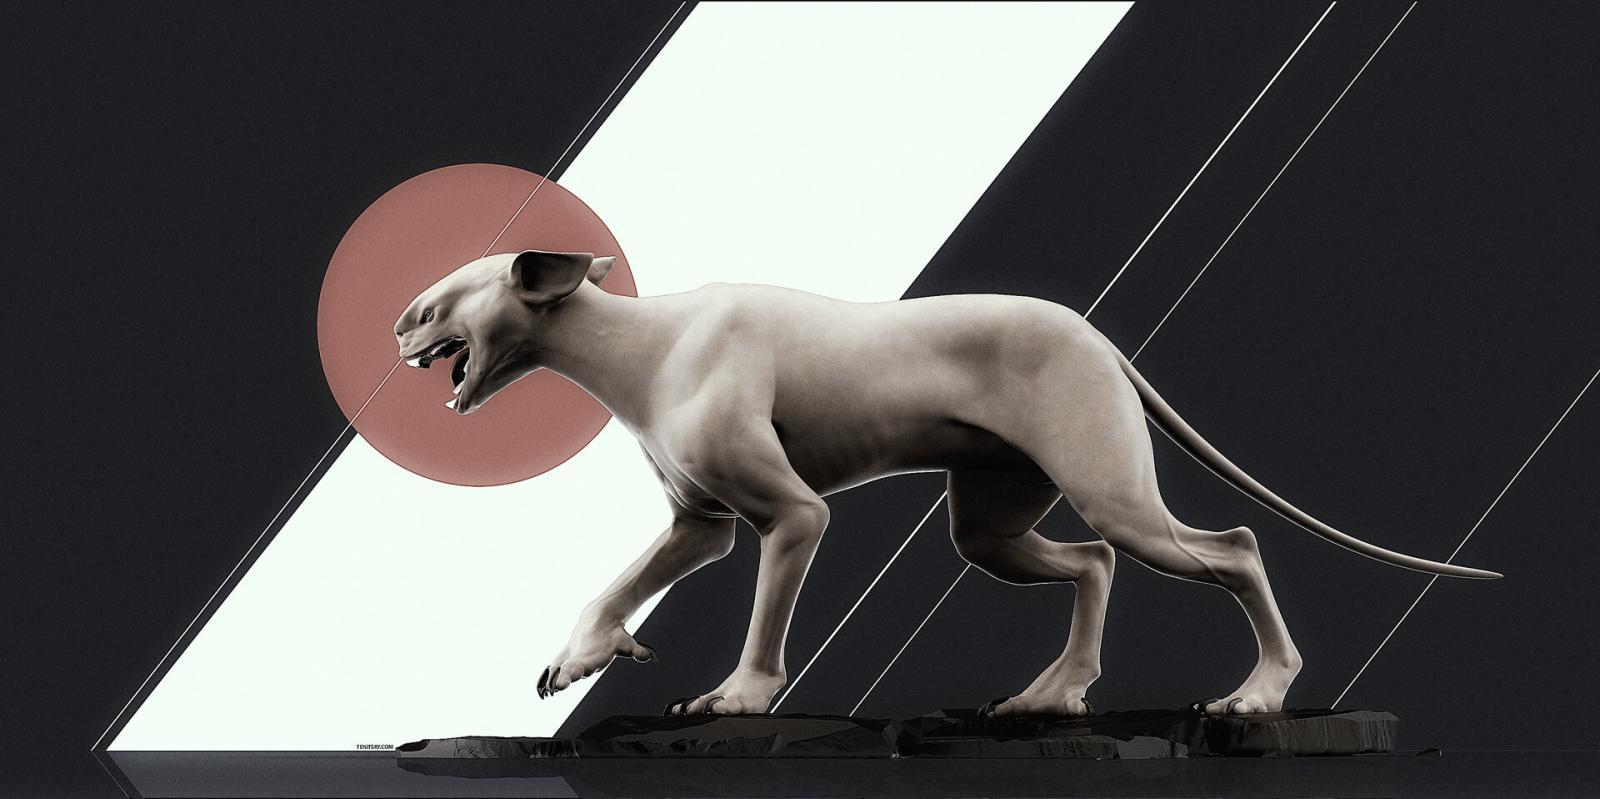 anton-tenitsky-side-creature-anton-tenitsky-02.jpg